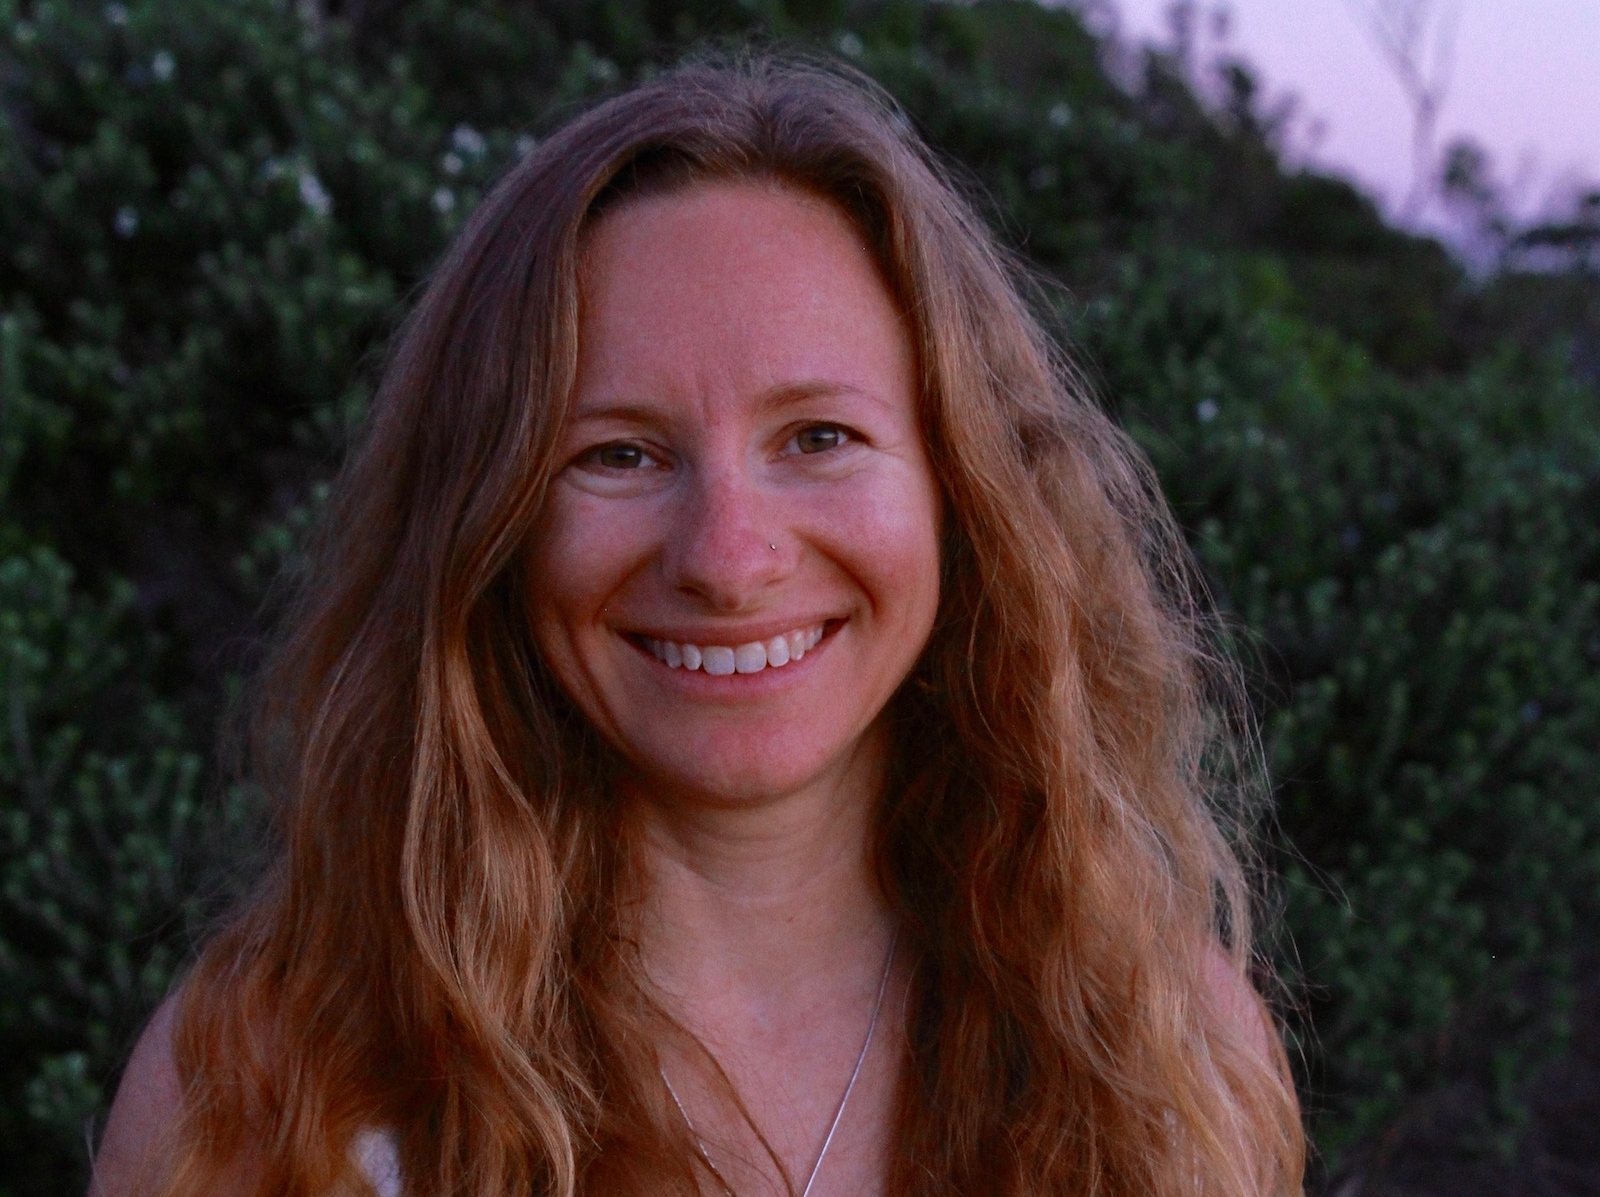 Carol Anne Sex, Love & Relationship Coaching